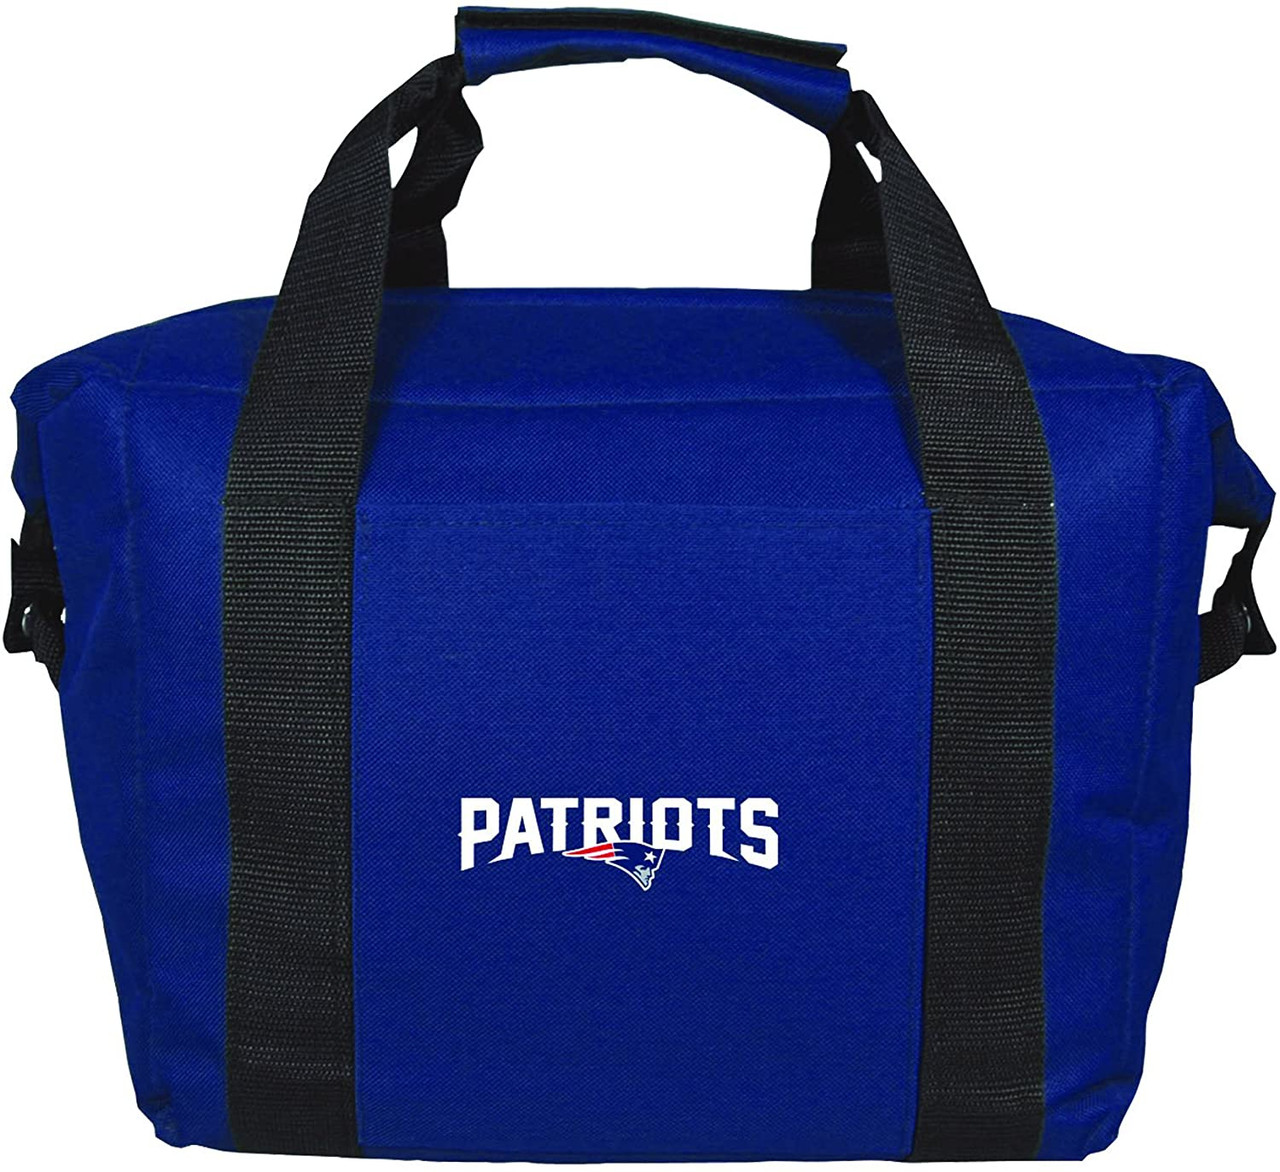 New England Patriots Kooler Bag 12 Pack